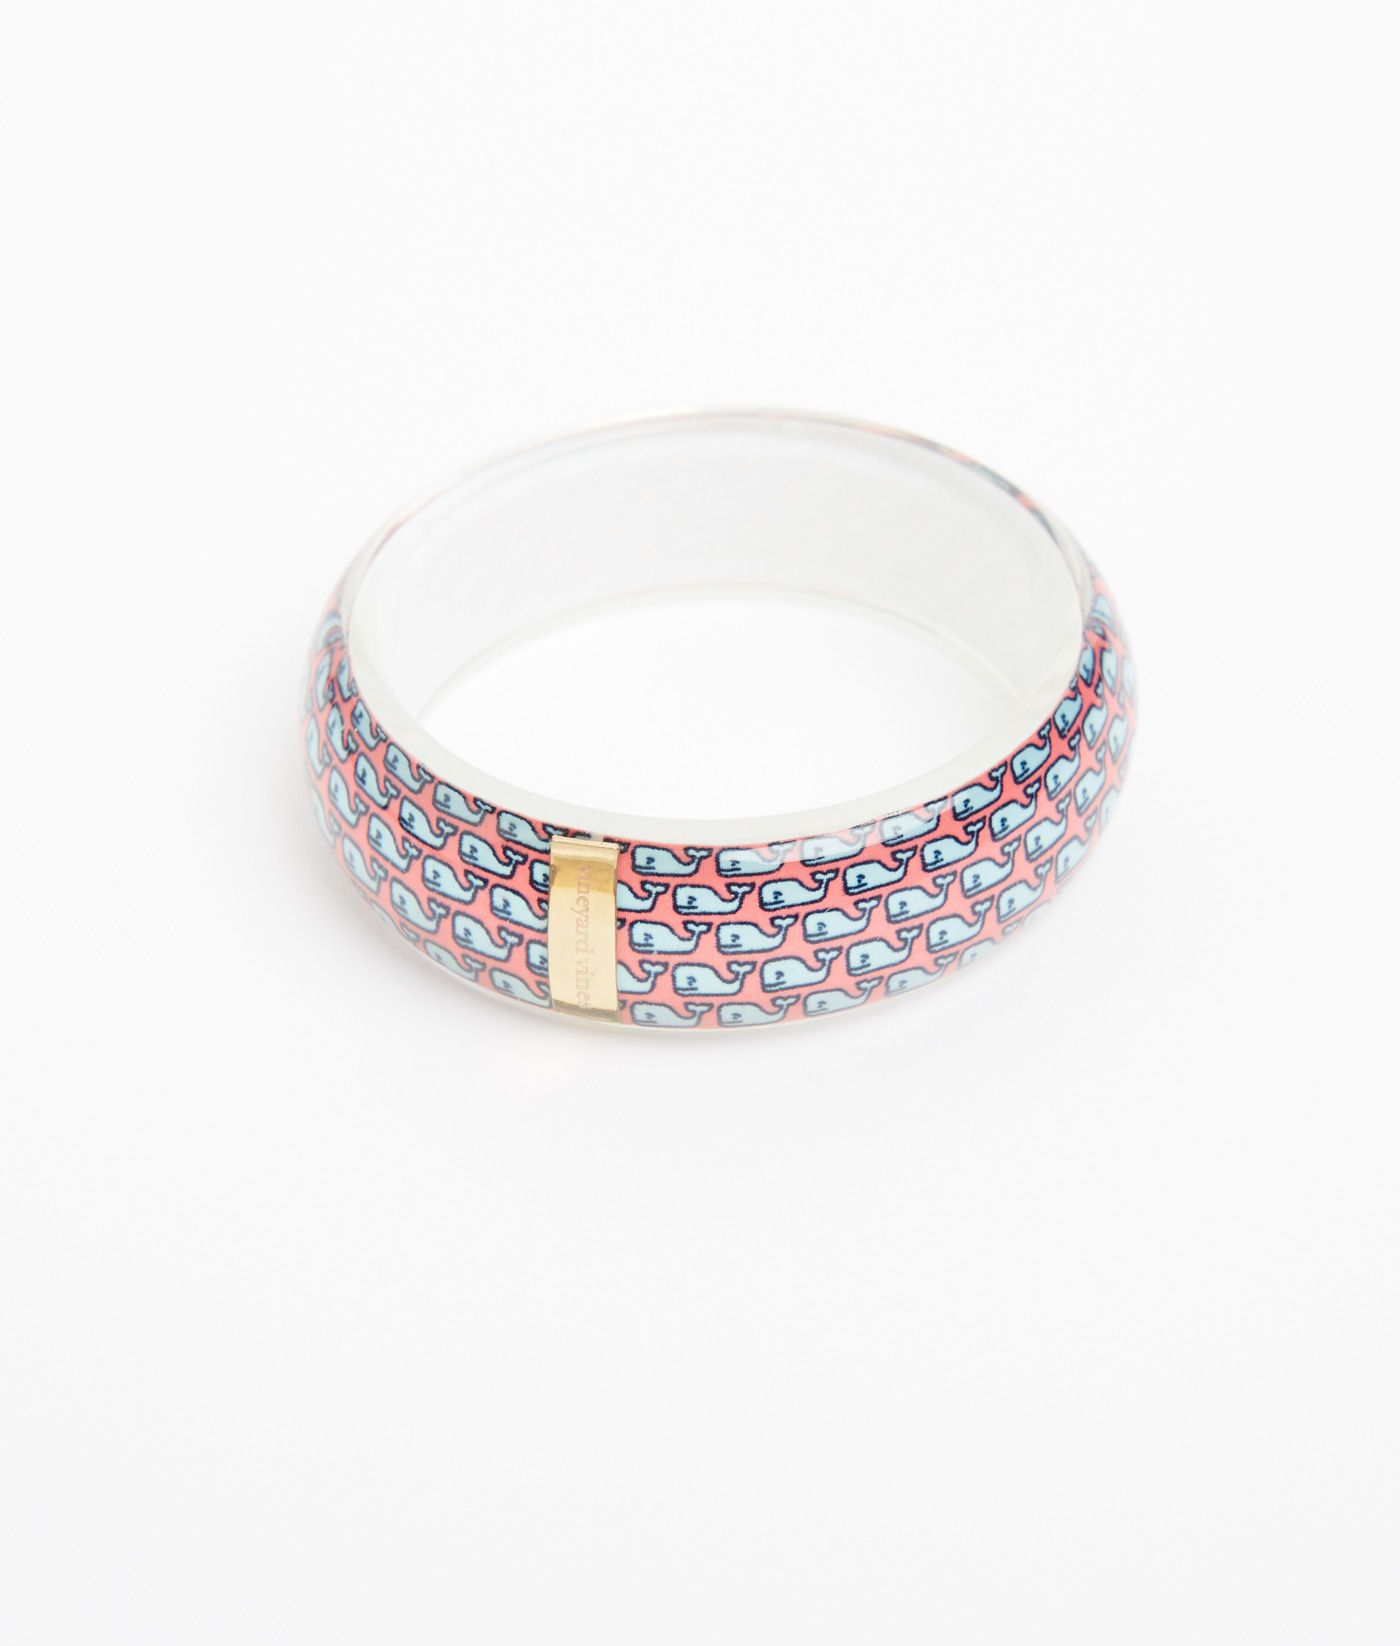 Shop jewelry whale bangle bracelet for women vineyard vines my